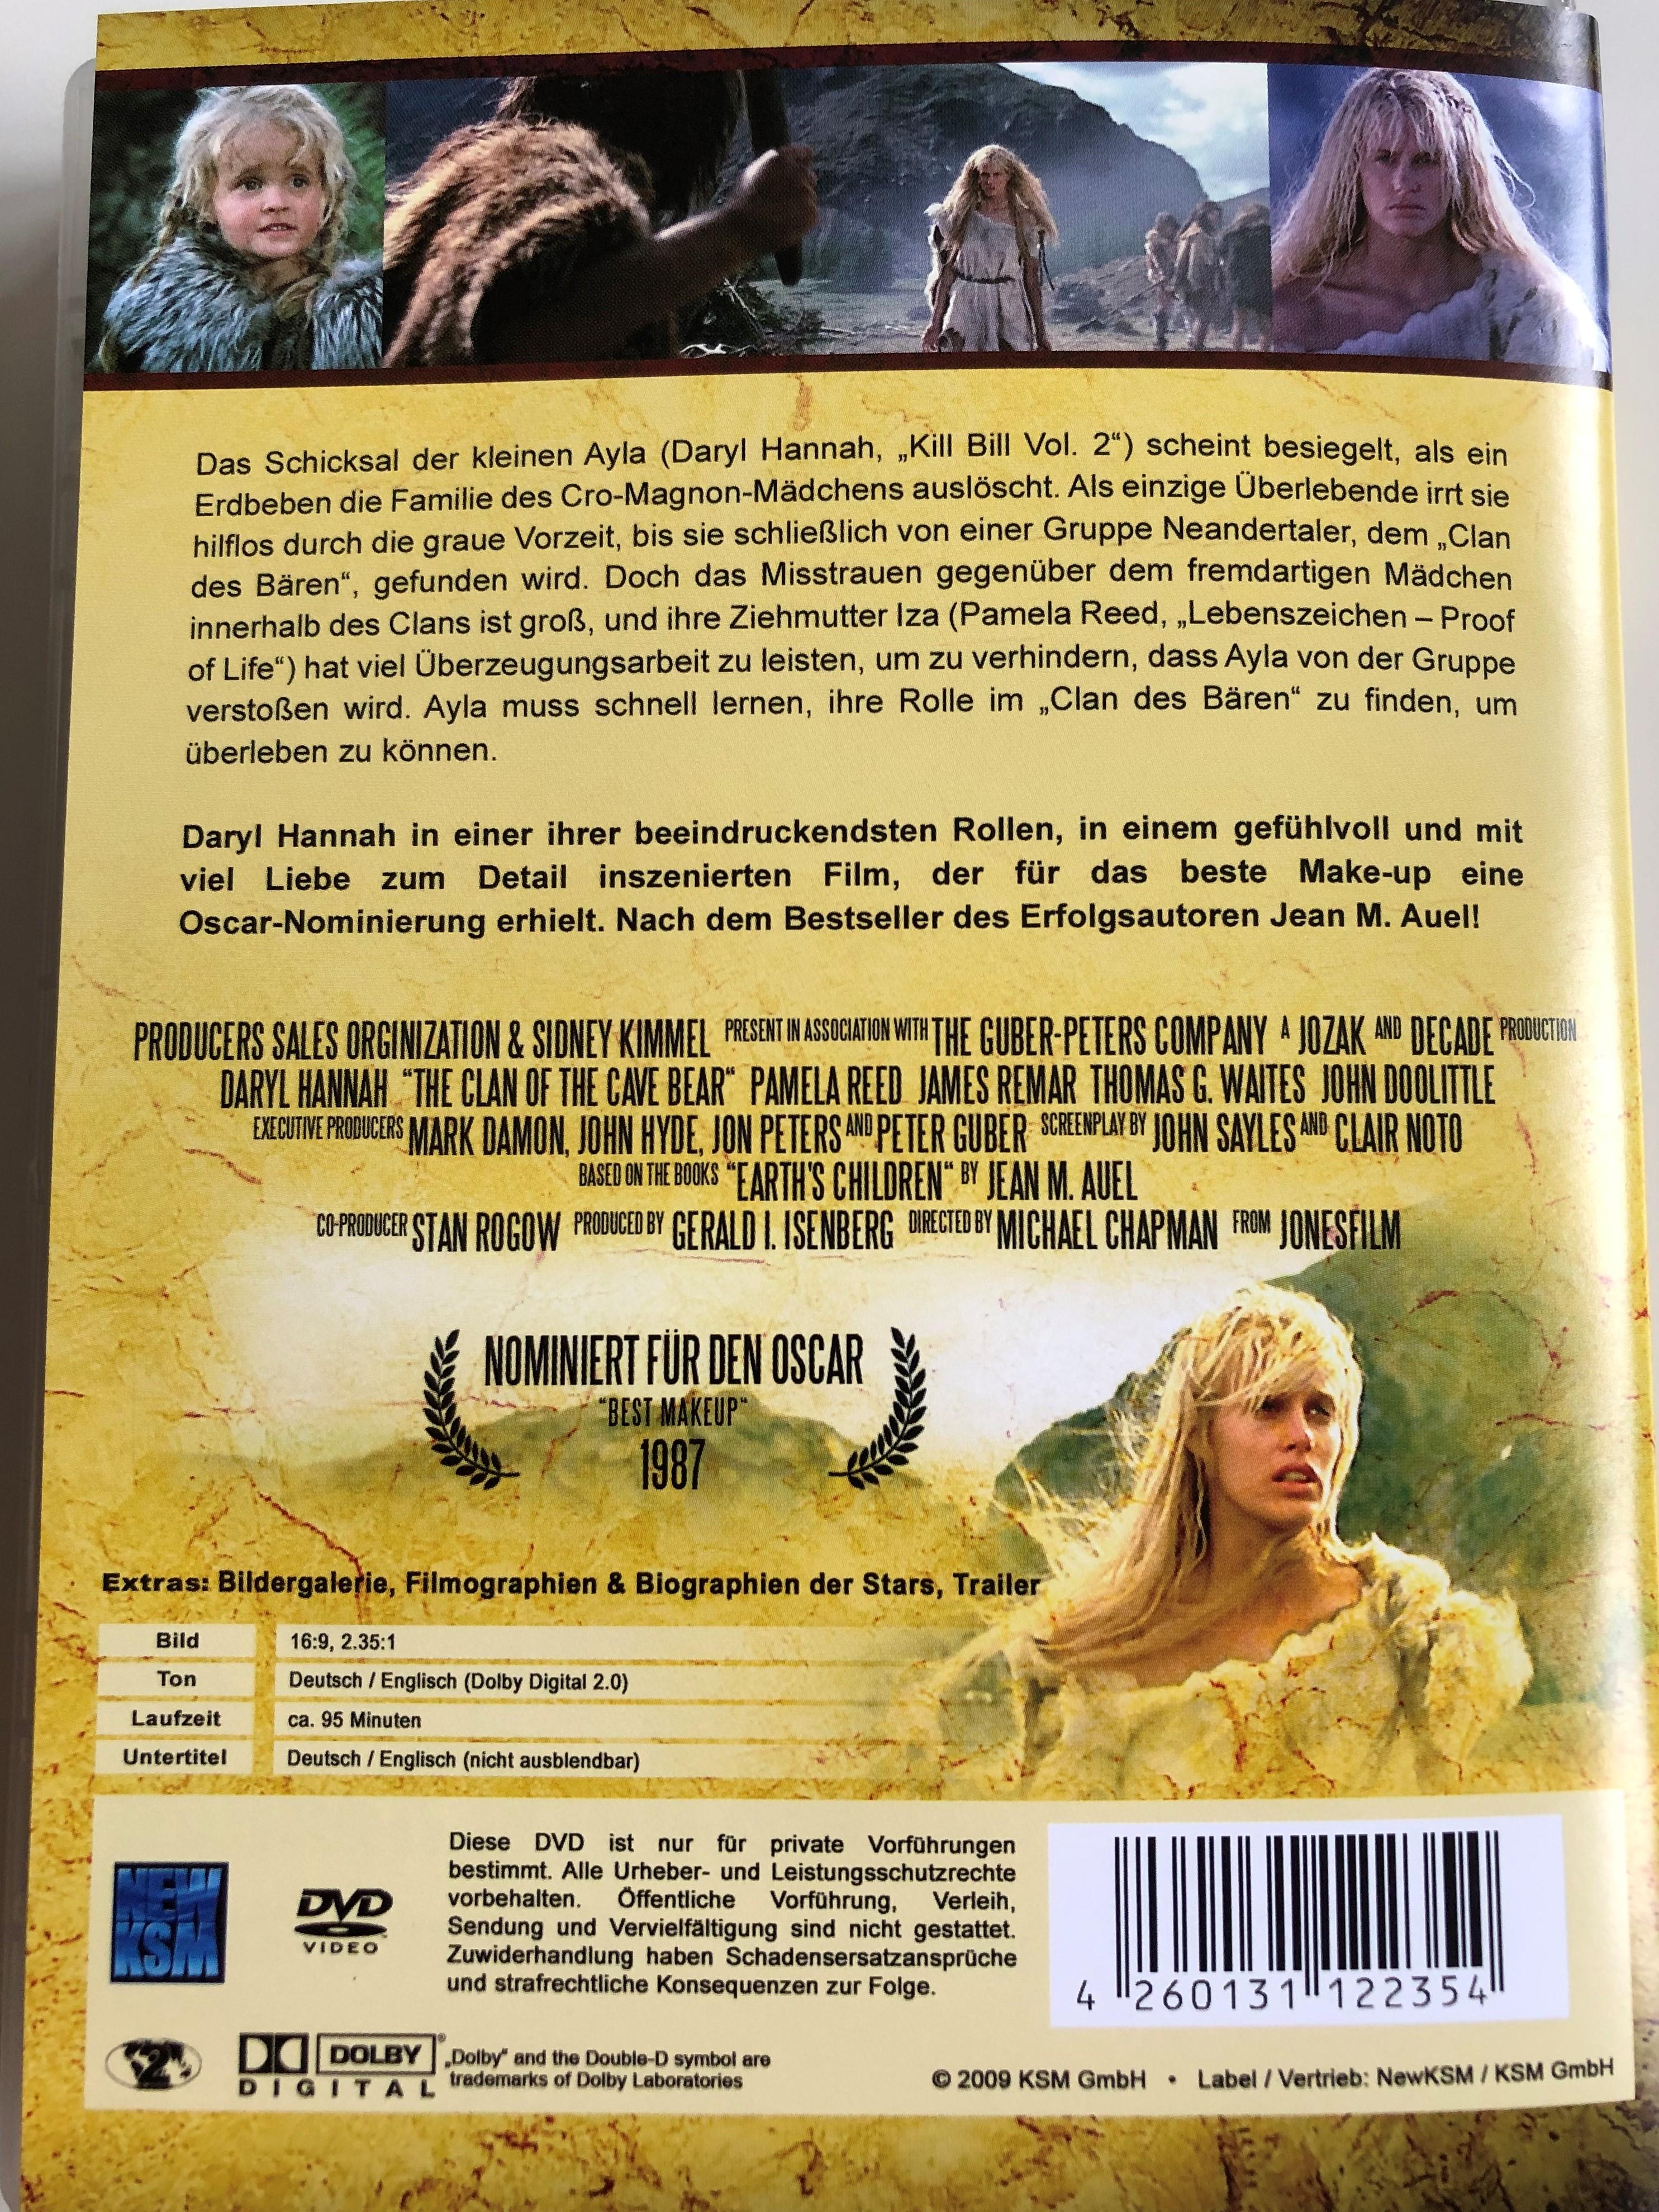 the-clan-of-the-cave-bear-dvd-1987-ayla-un-der-clan-des-b-ren-directed-by-michael-chapman-starring-daryl-hannah-pamela-reed-james-remar-thomas-waites-john-doolittle-2-.jpg